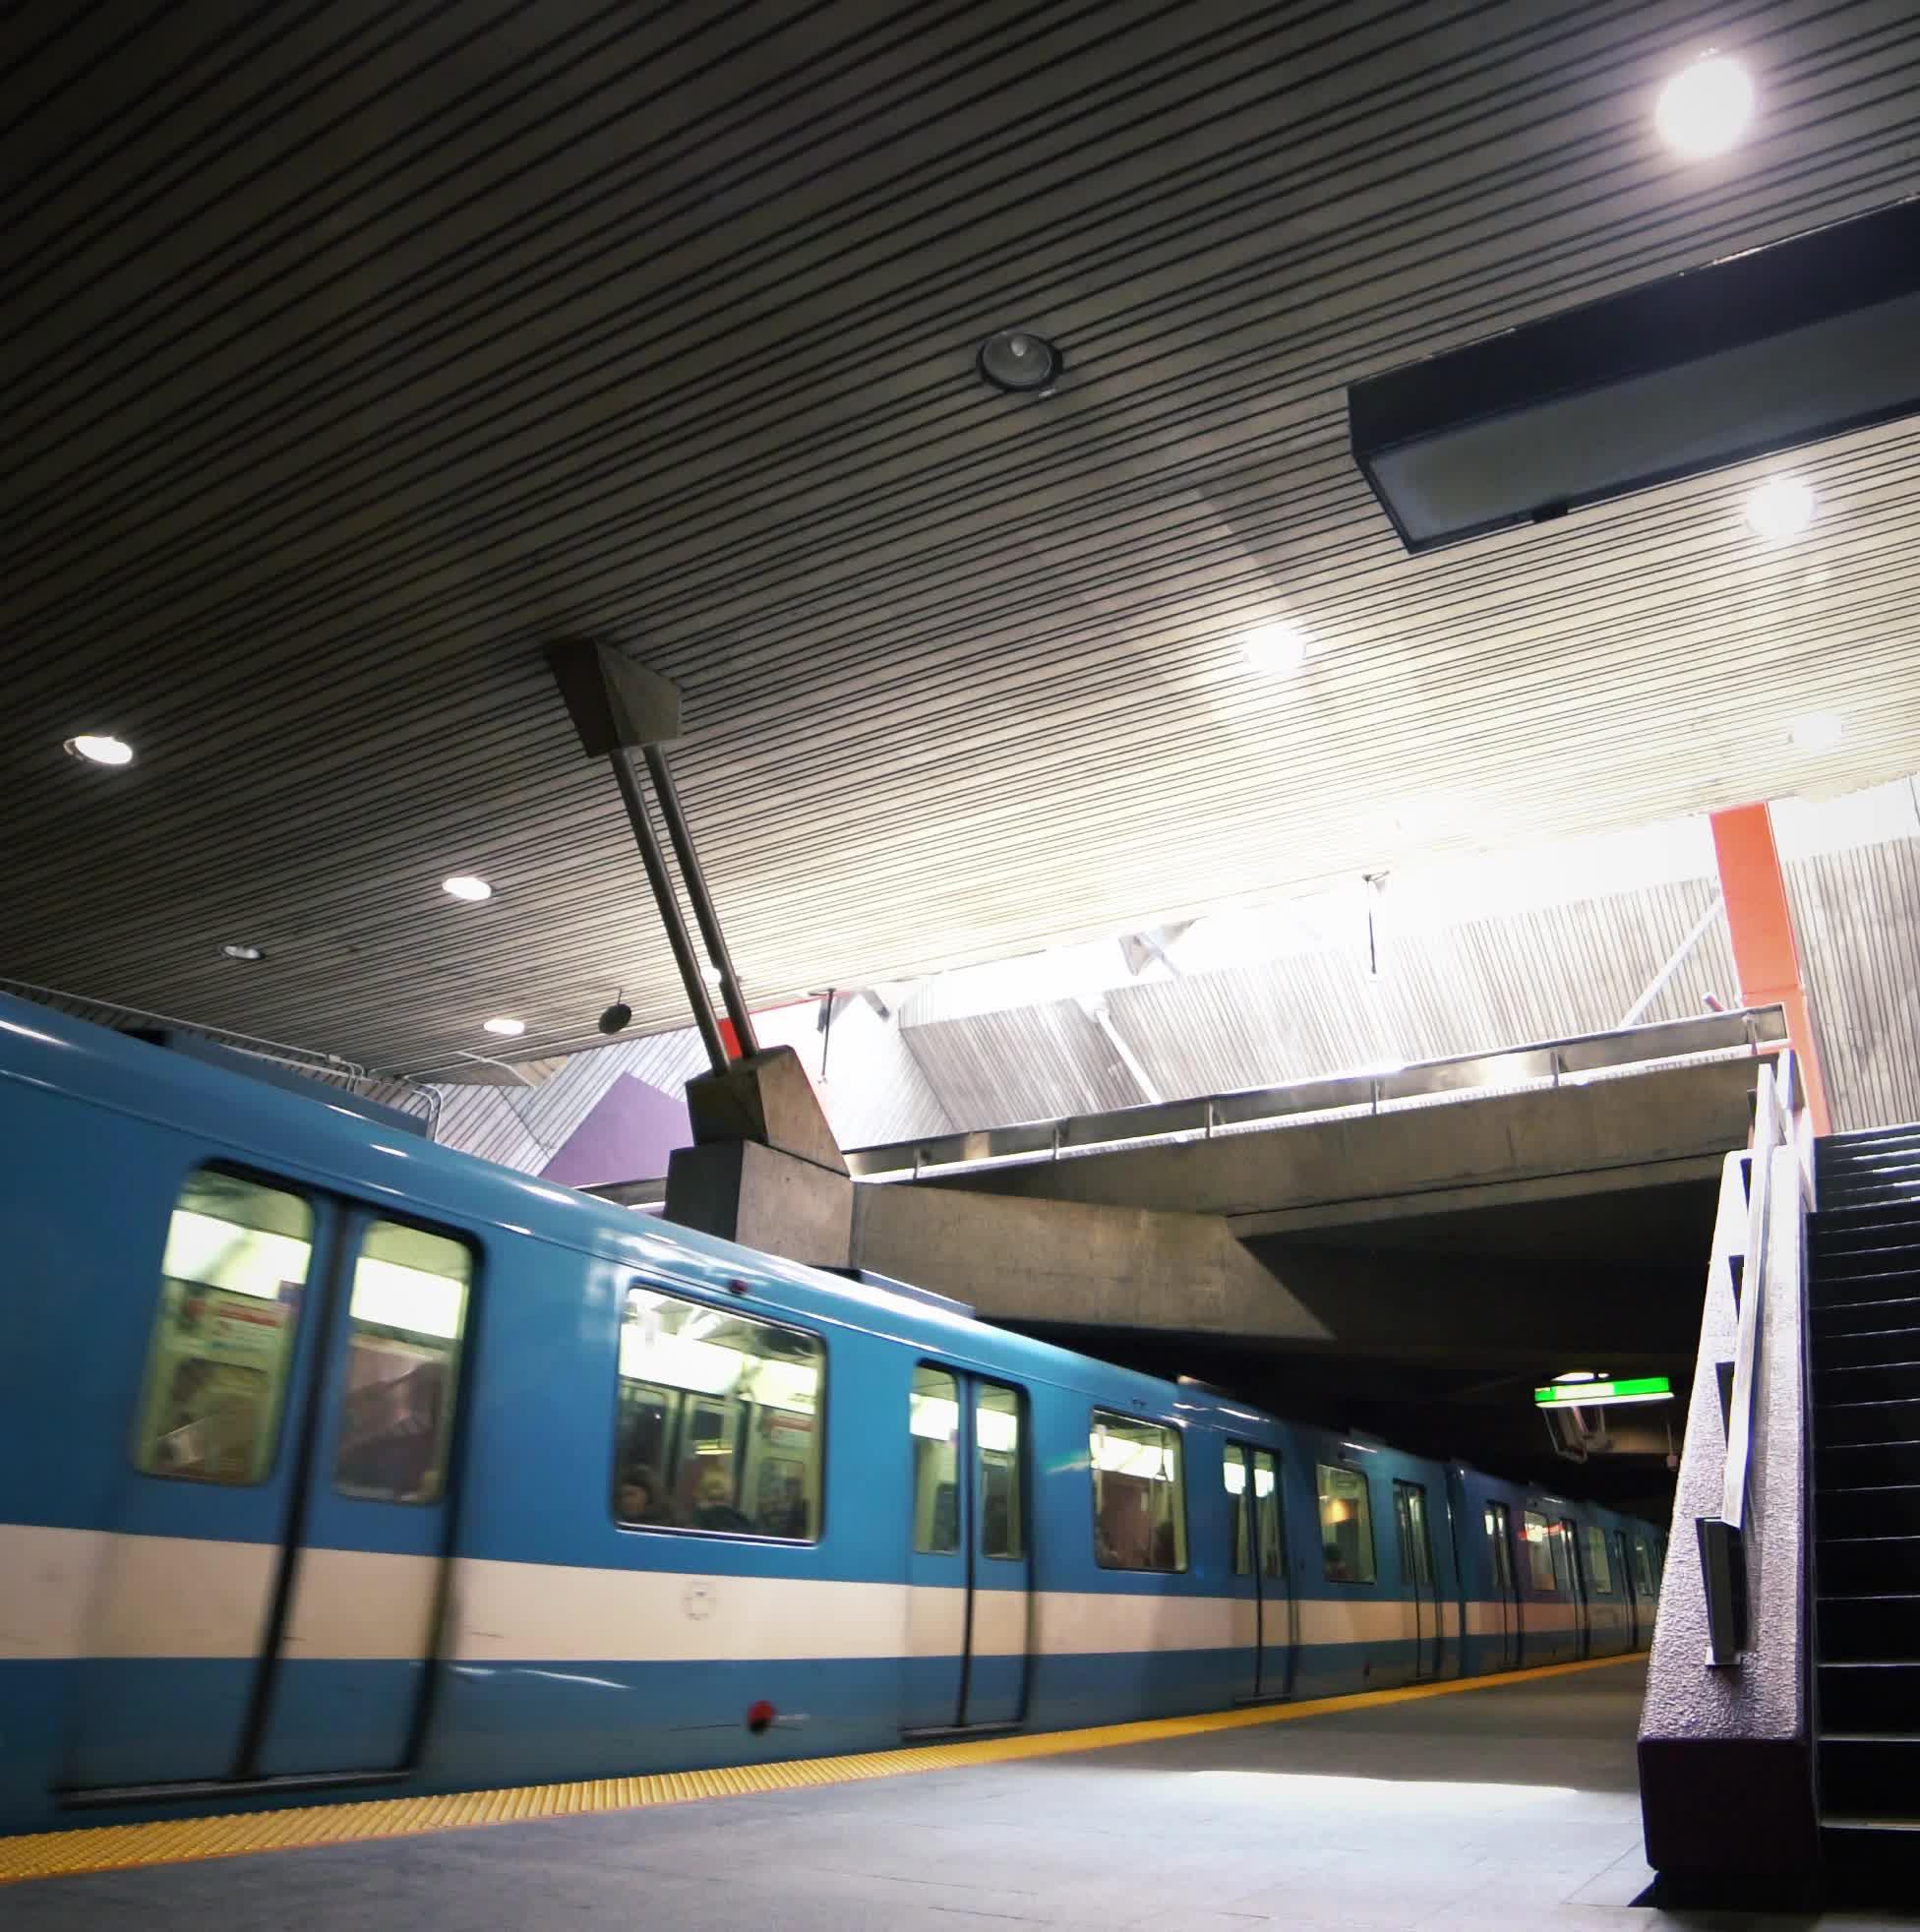 Montreal Metro Loop #16 GIFs